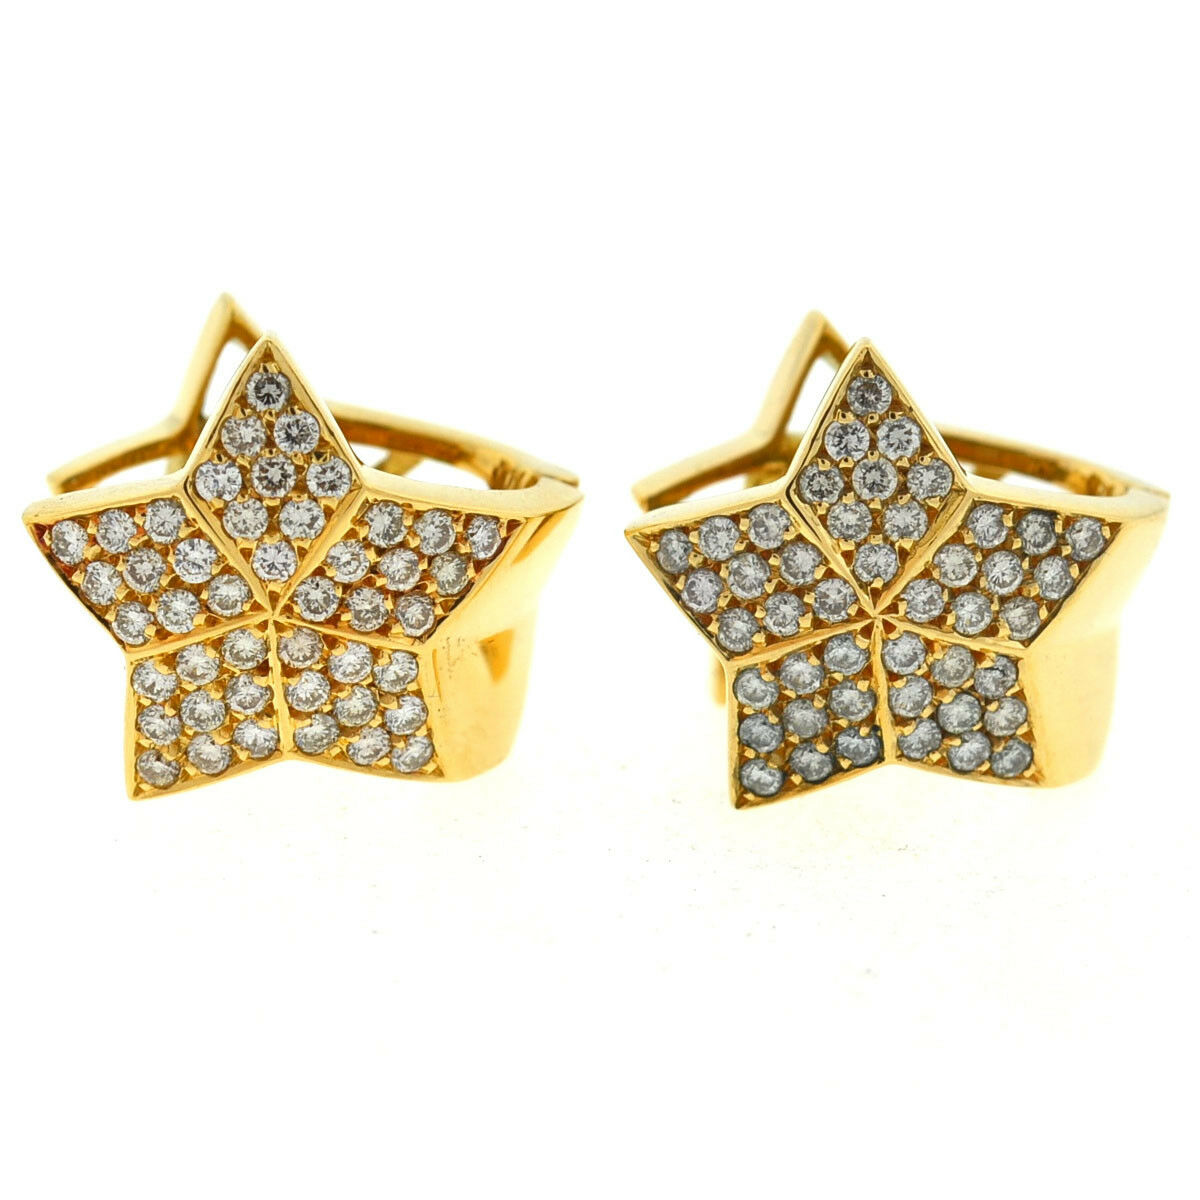 18k Yellow gold Pave Star Diamond Earrings